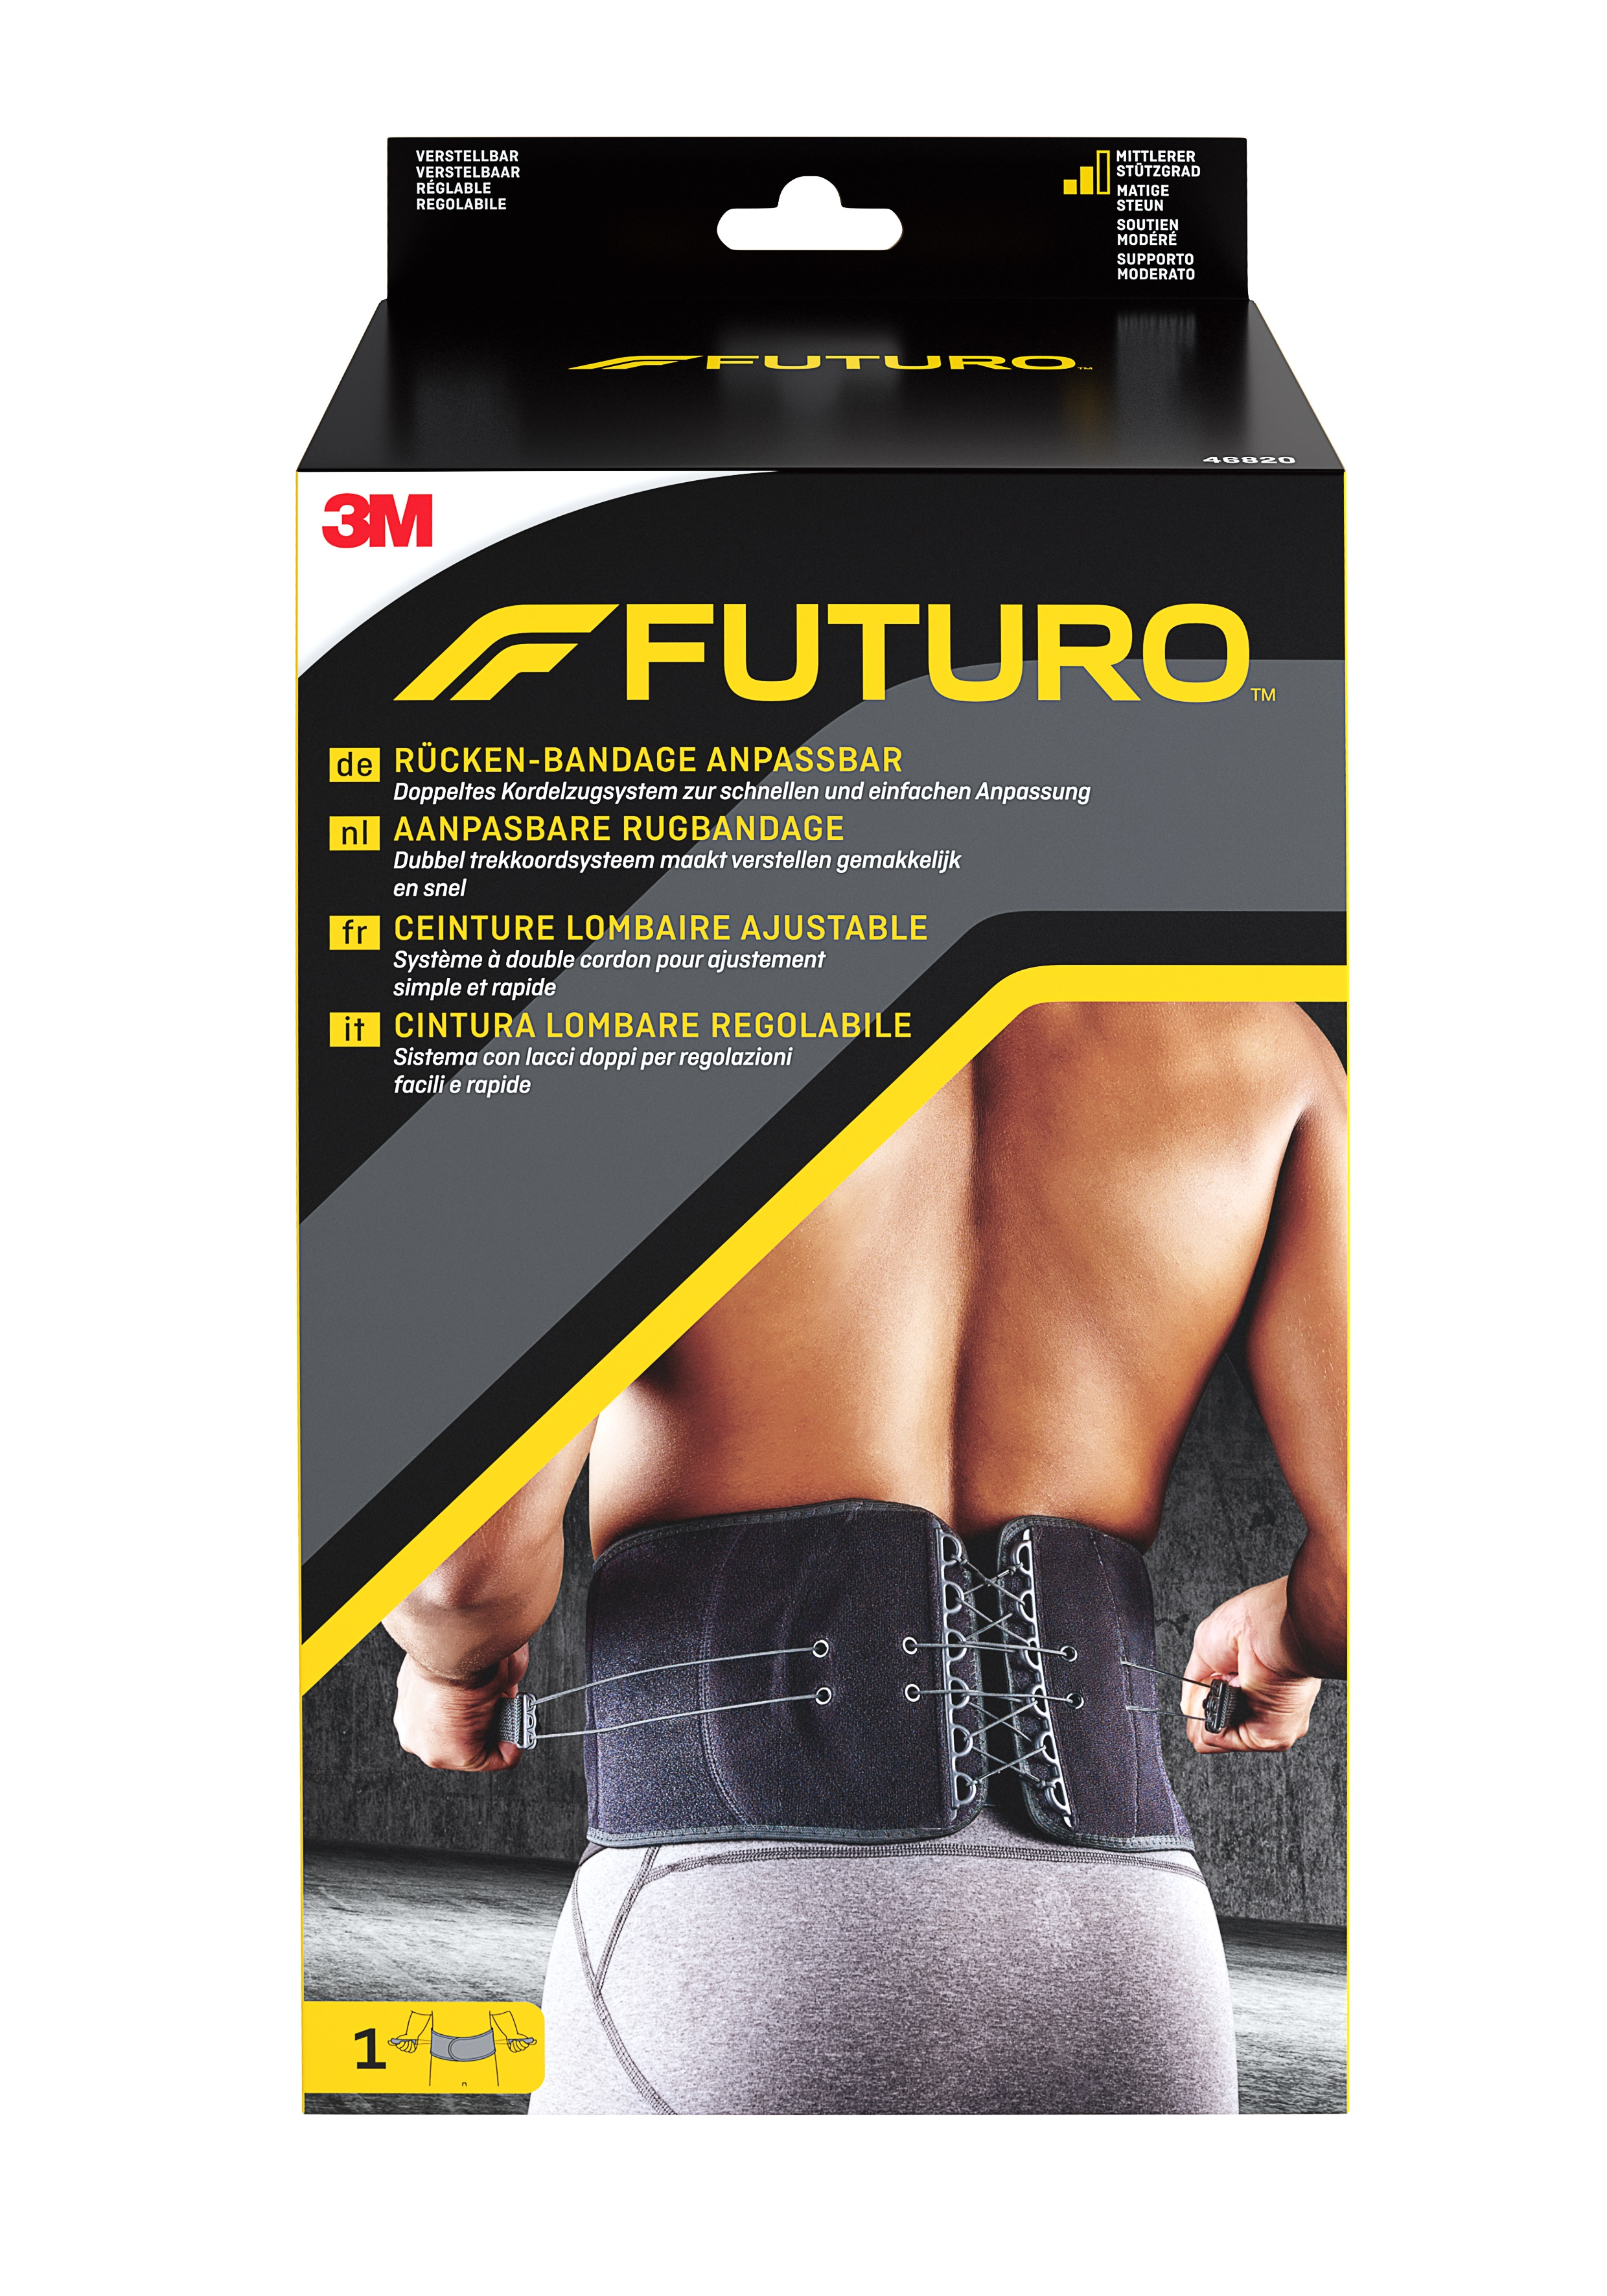 FUTURO™ Rücken-Bandage, anpassbar